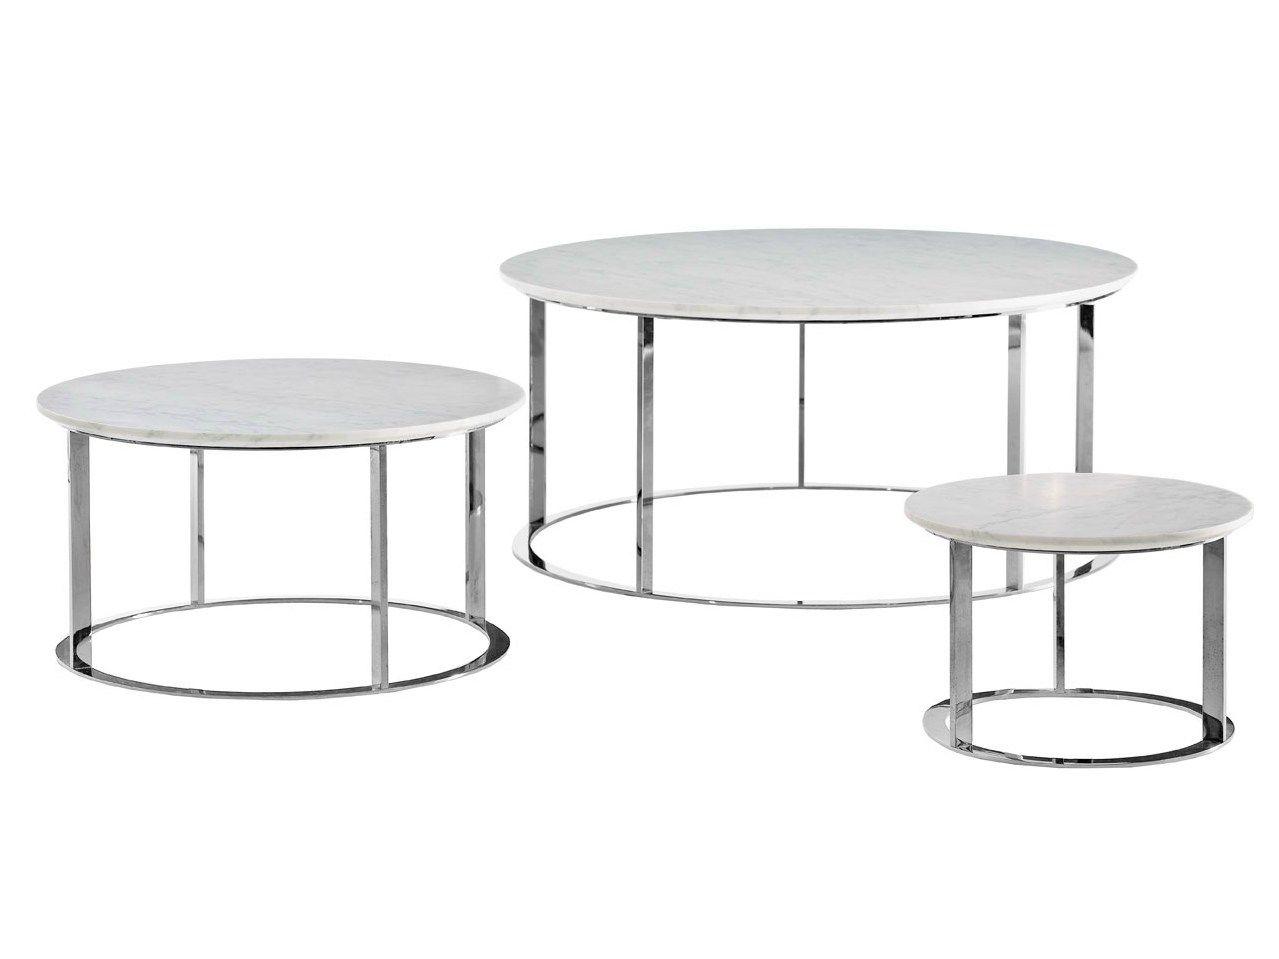 Round Marble Coffee Table Mera By B B Italia Design Antonio Citterio B B Italia Mesas De Cafe De Marmol Mesas De Cafe [ 959 x 1279 Pixel ]